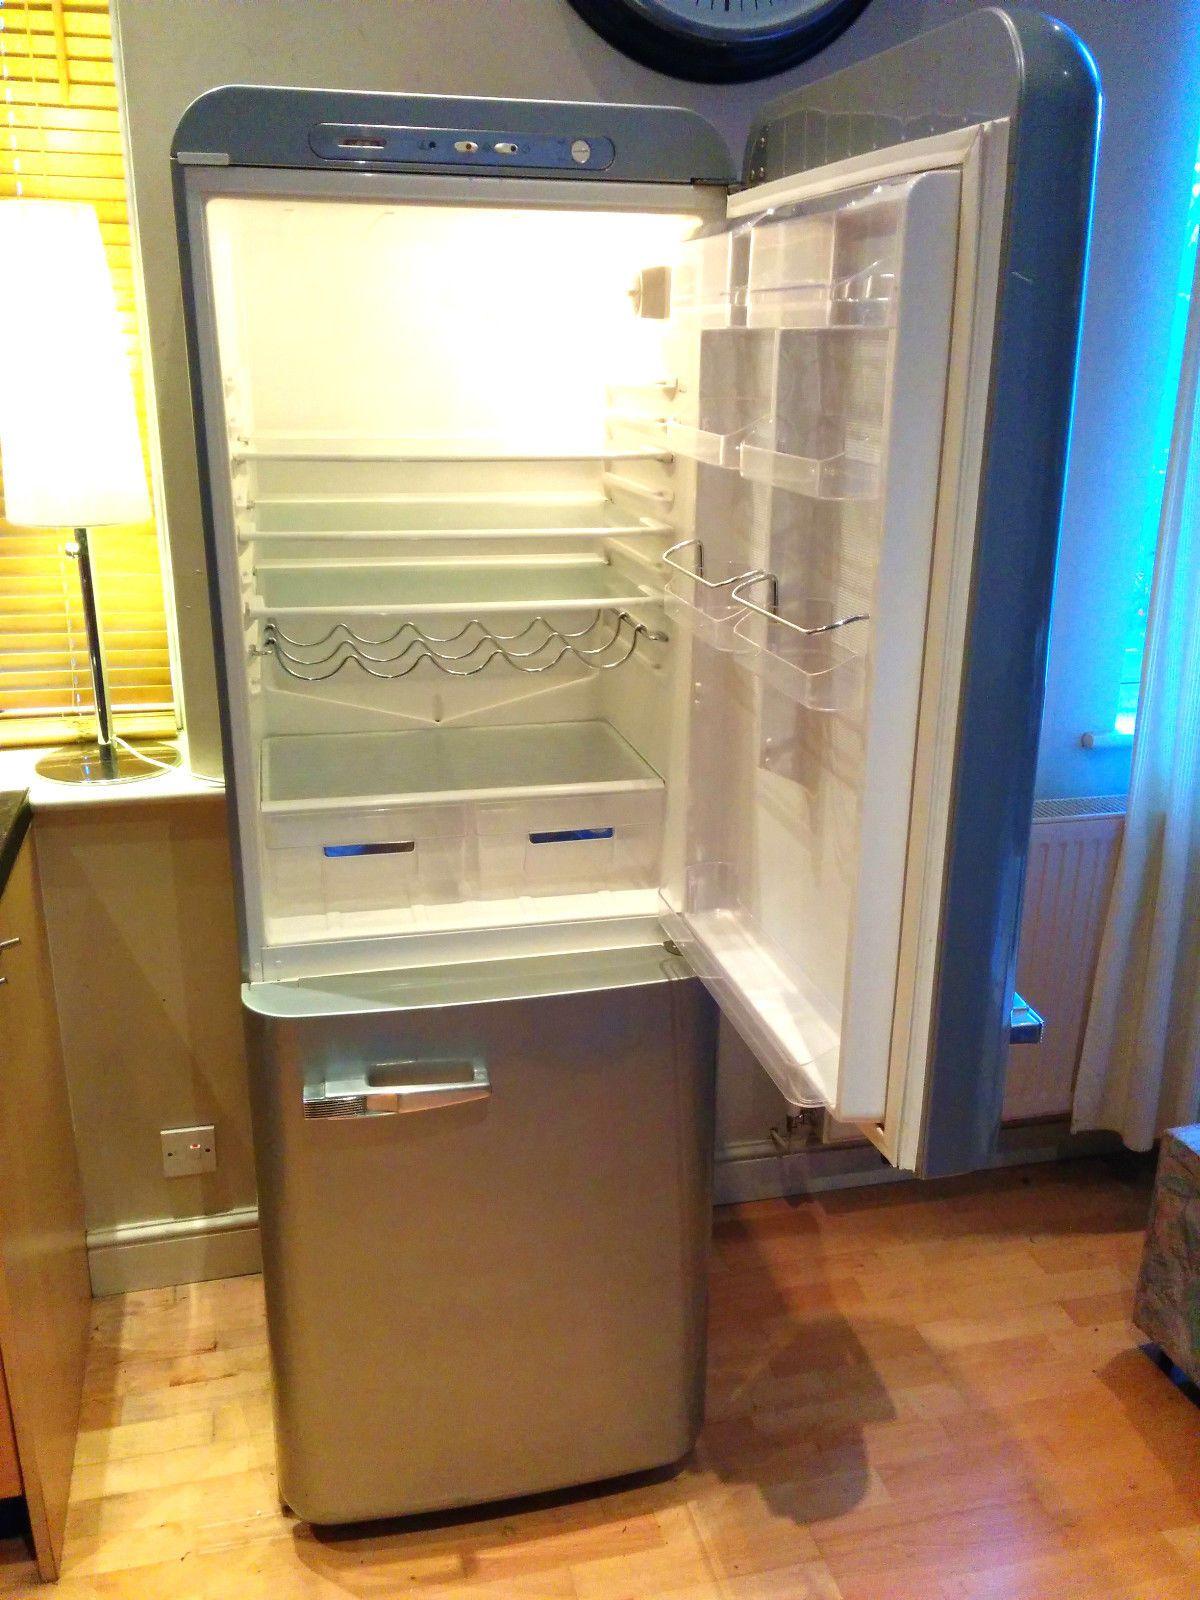 Uncategorized Ebay Appliances Kitchen smeg fab32 retro fridge freezer 8017709172961 ebay products freezers appliances